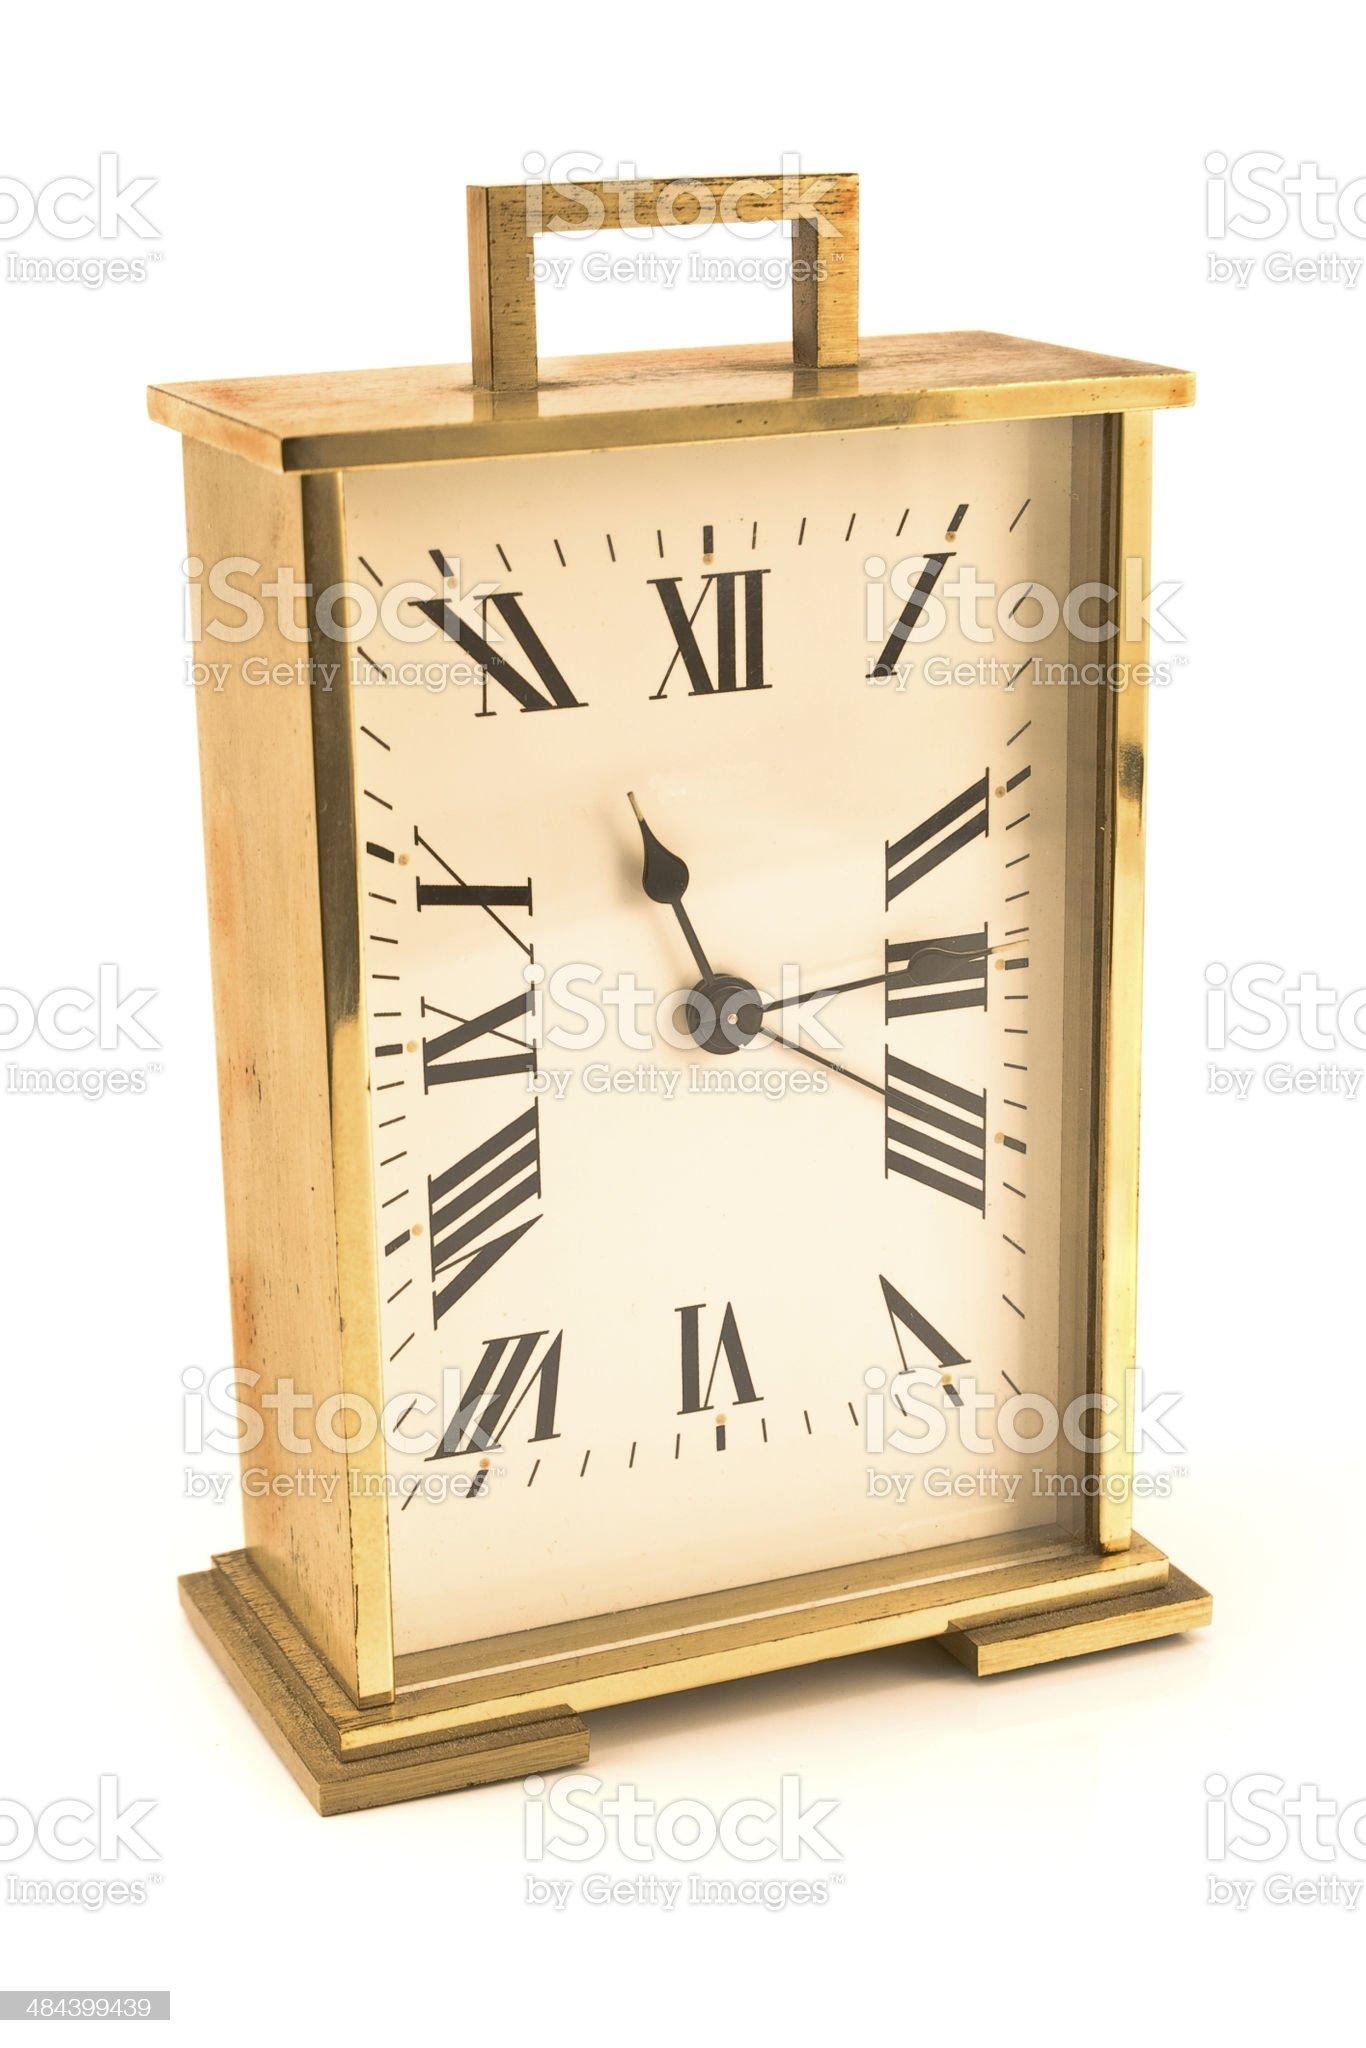 Golden alarm clock royalty-free stock photo